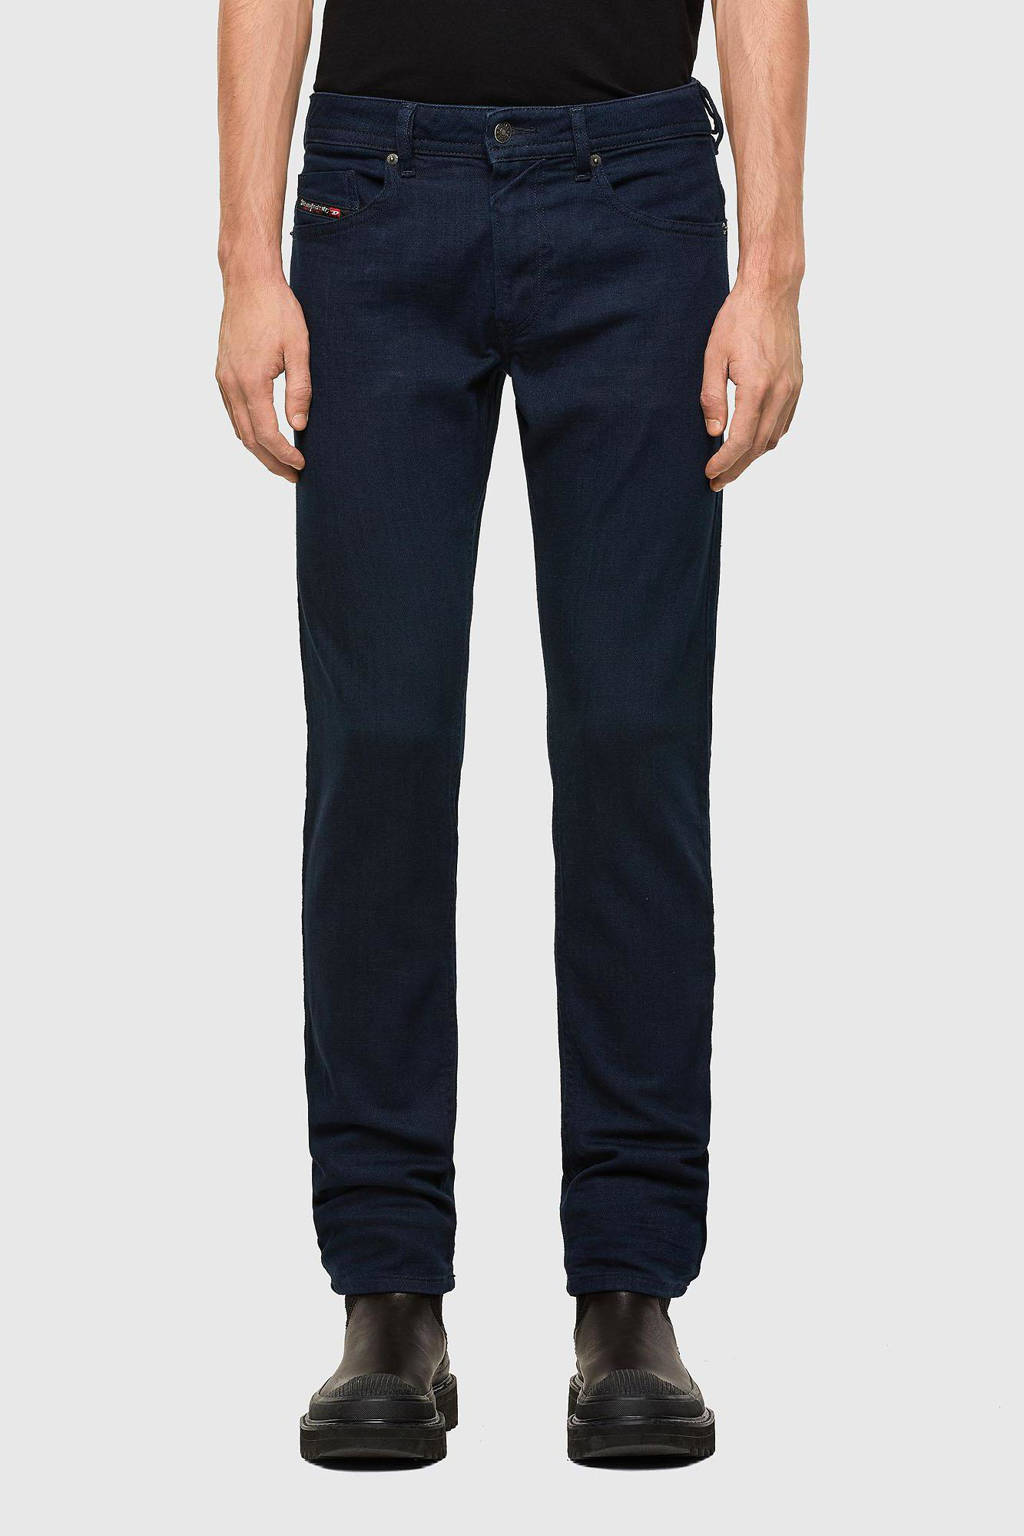 Diesel slim fit jeans Thommer 01 / dark blue, 01 / Dark Blue